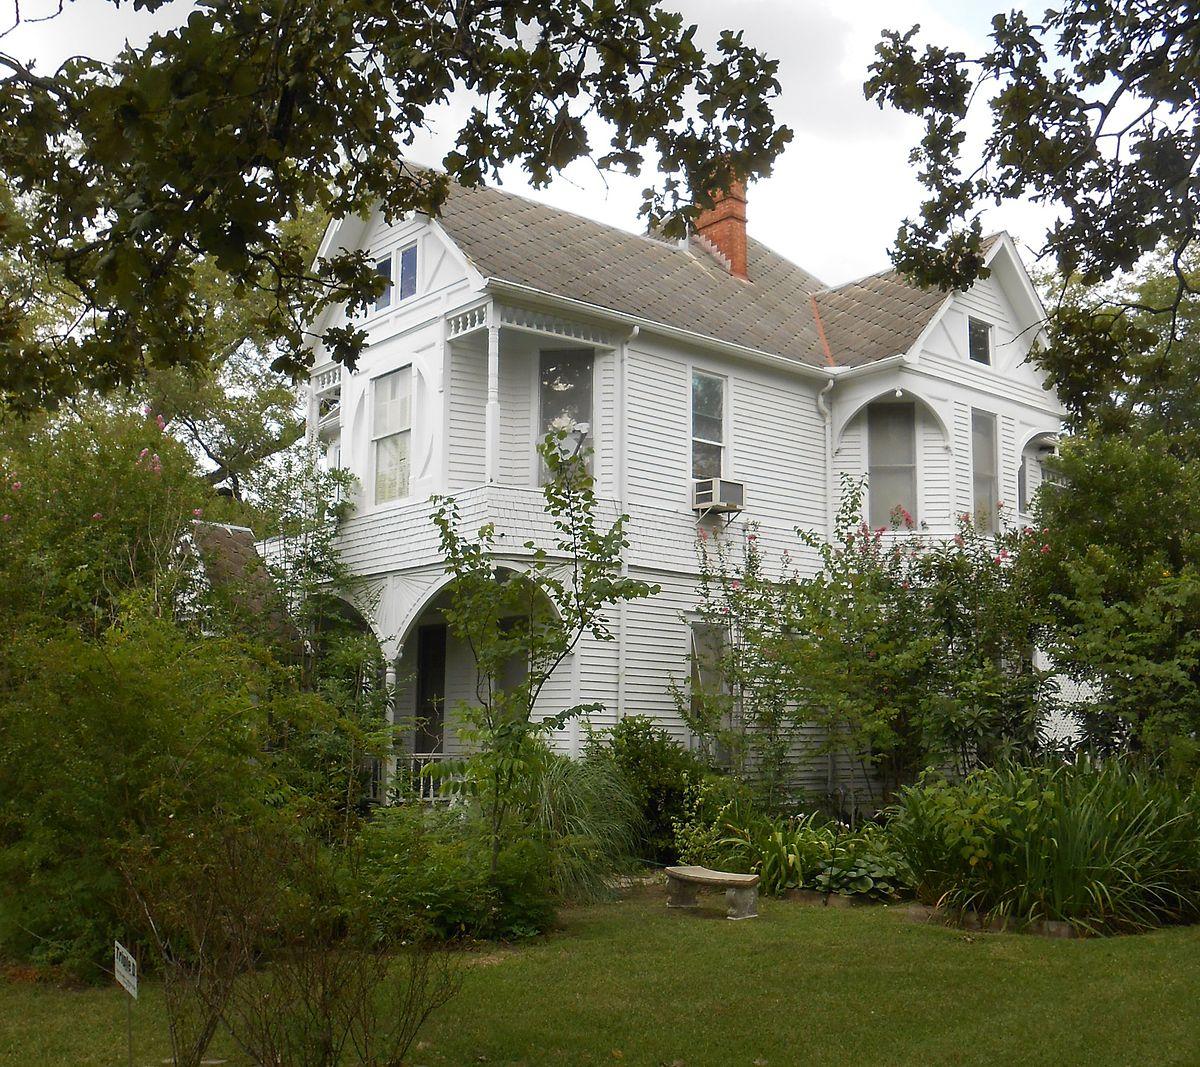 Little House (Victoria, Texas)